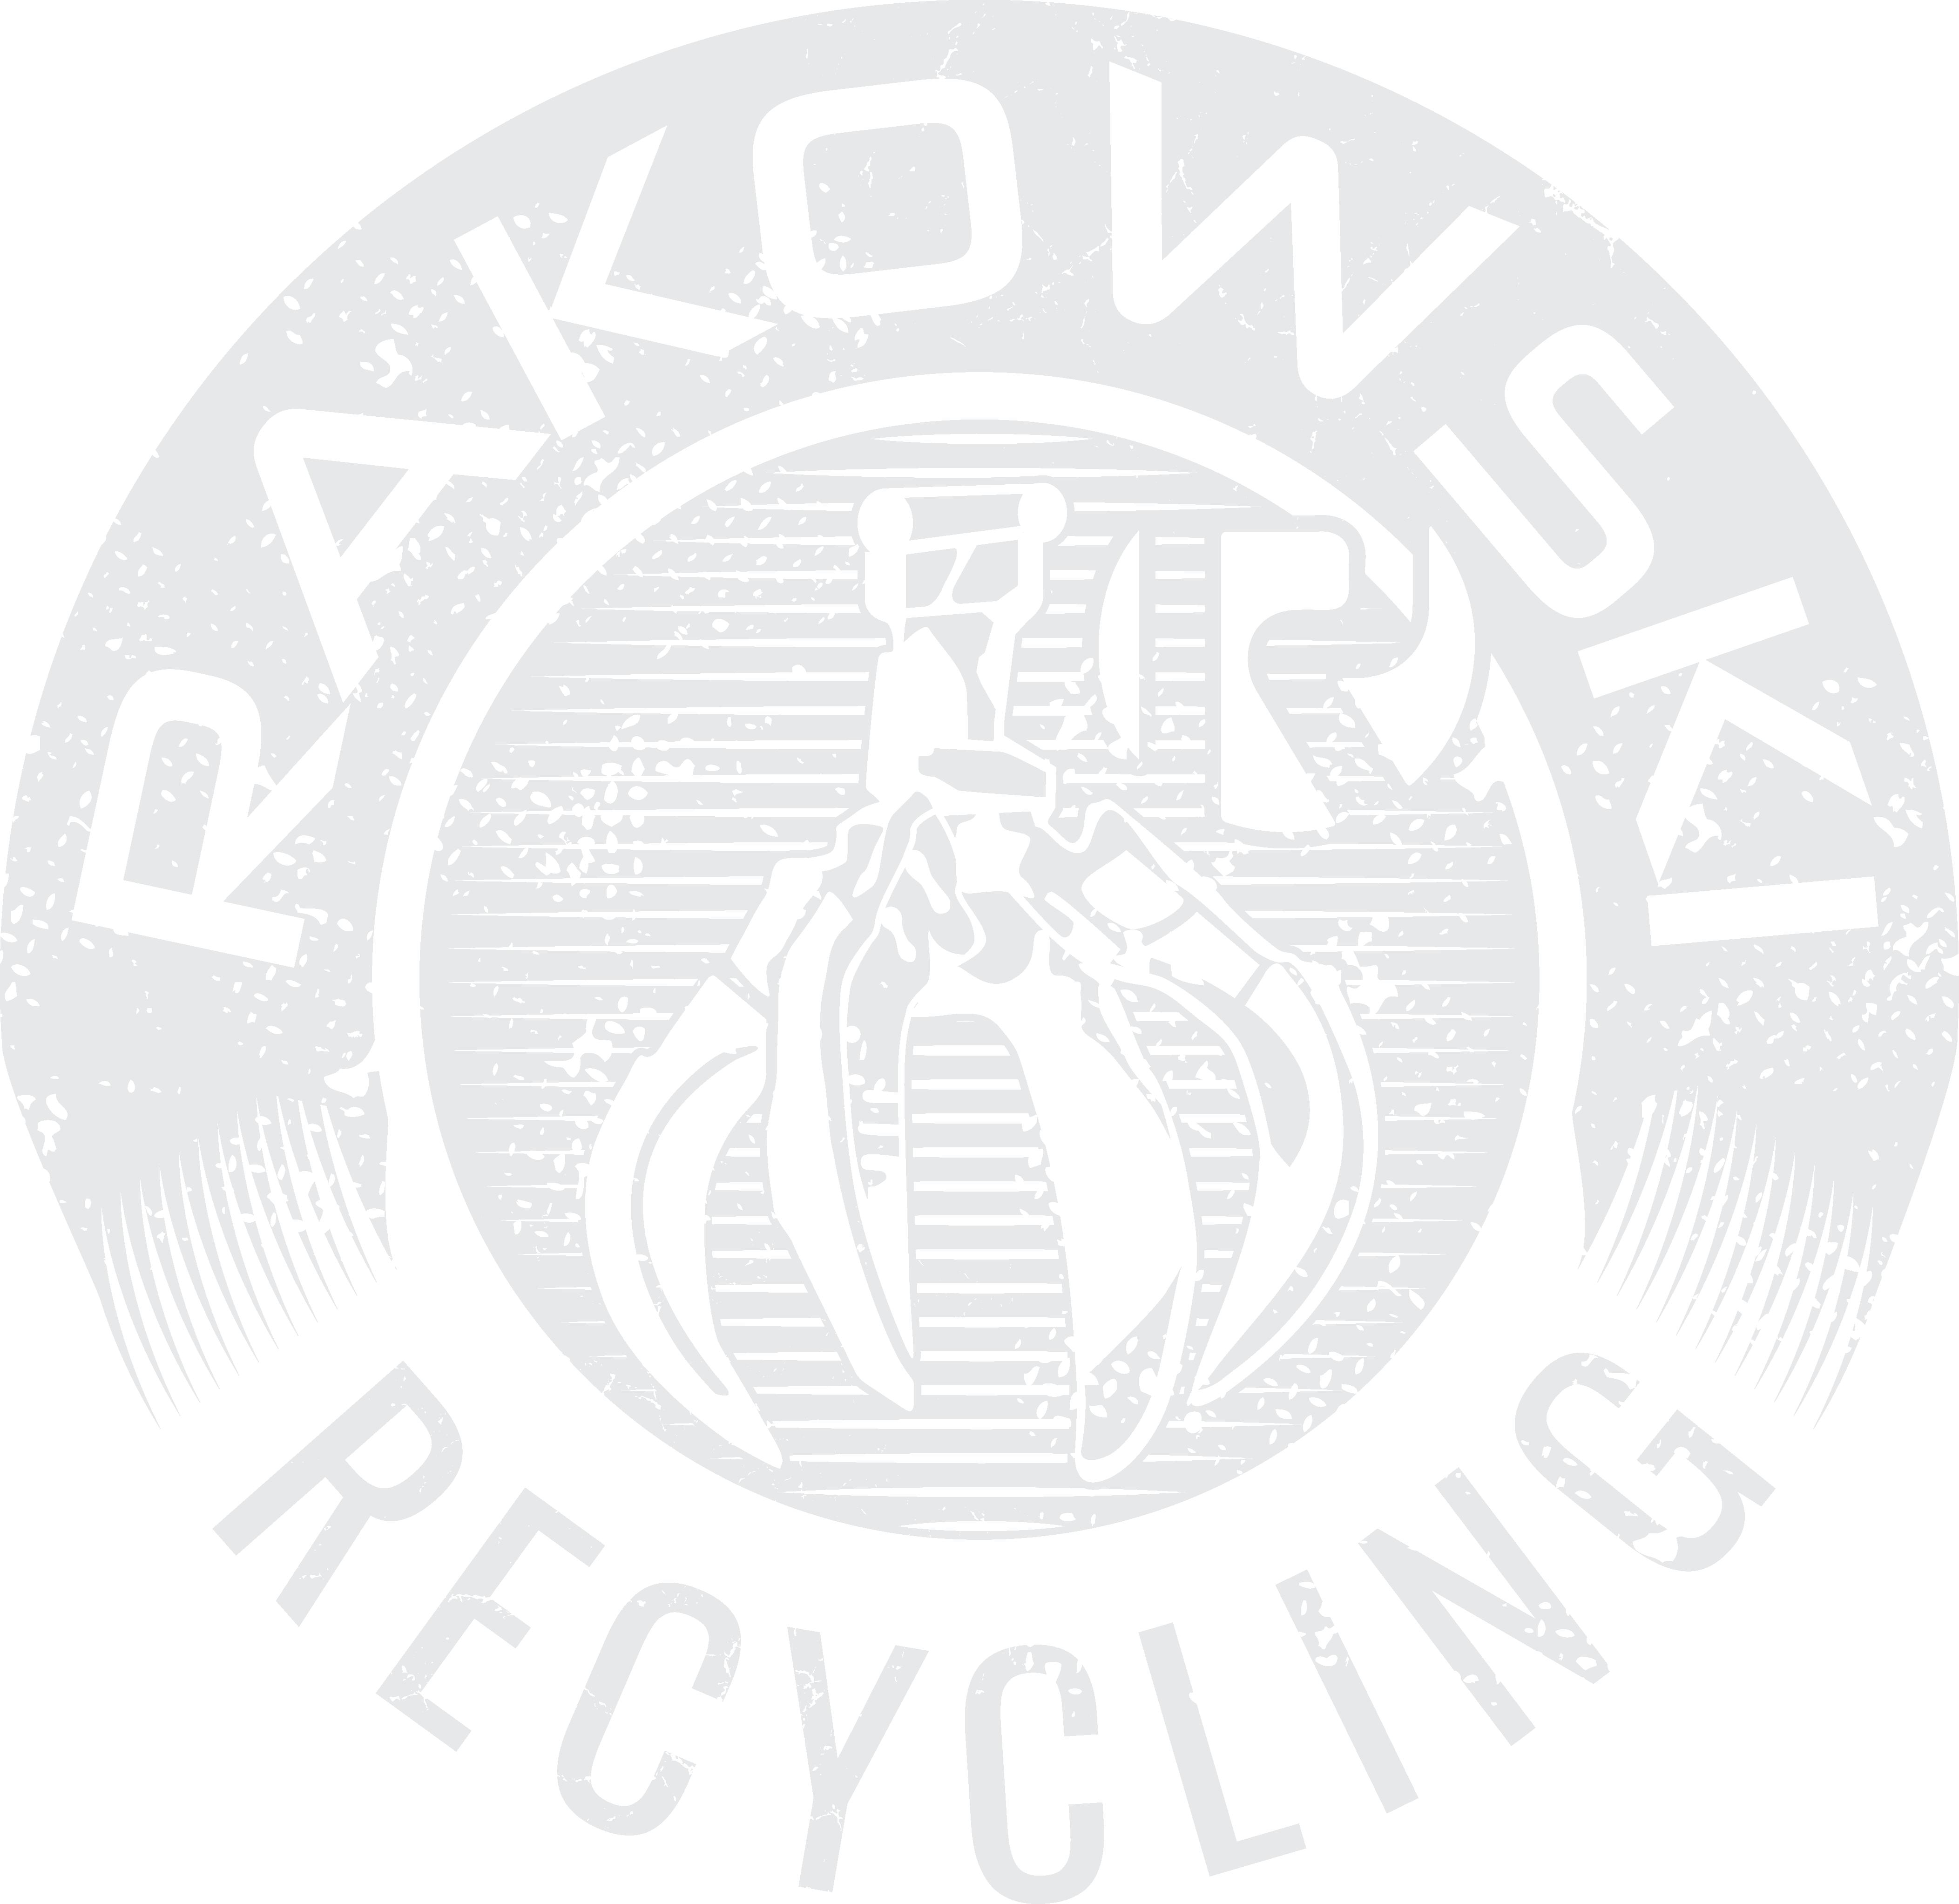 Tshirt design for a scrap metal recycling company